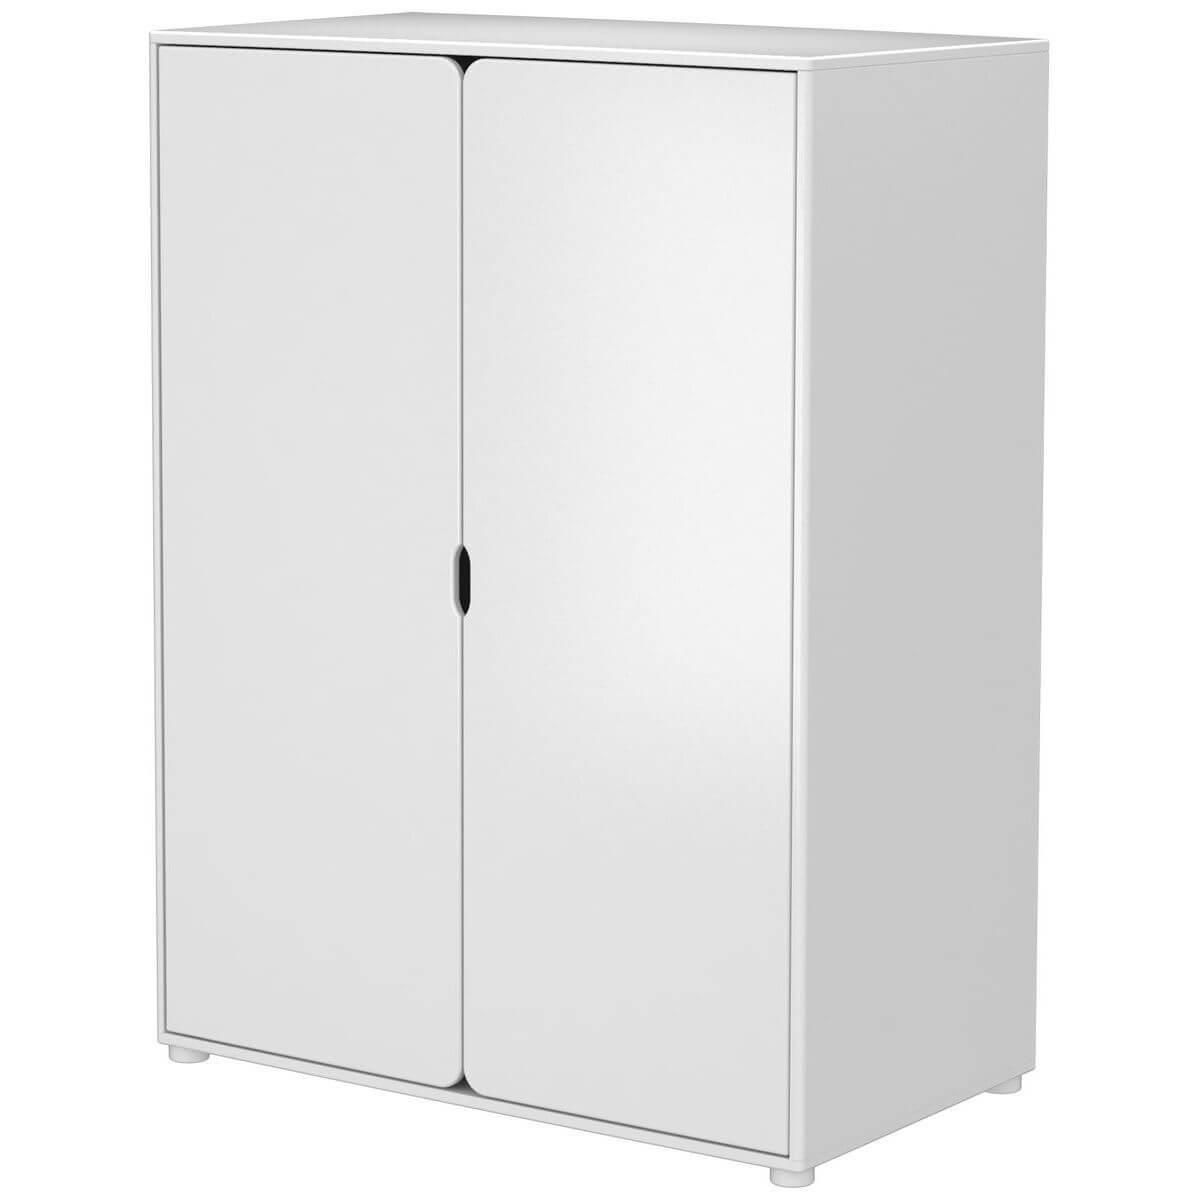 Armario infantil alto 2 puertas 4 estantes 1 barra CABBY Flexa blanco